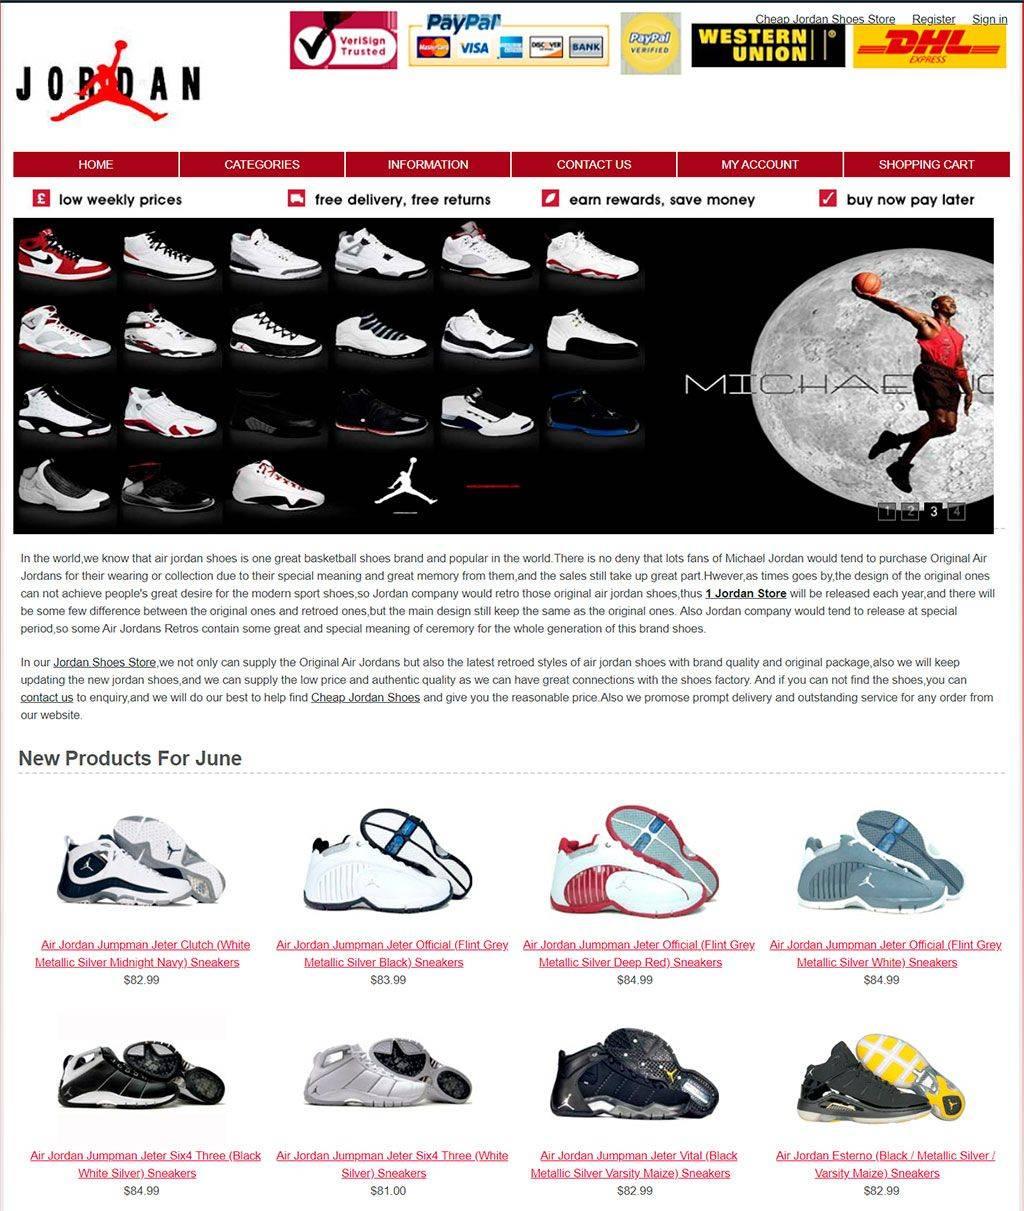 1jordanstore.com Tienda Online Falsa Zapatillas Nike Jordan